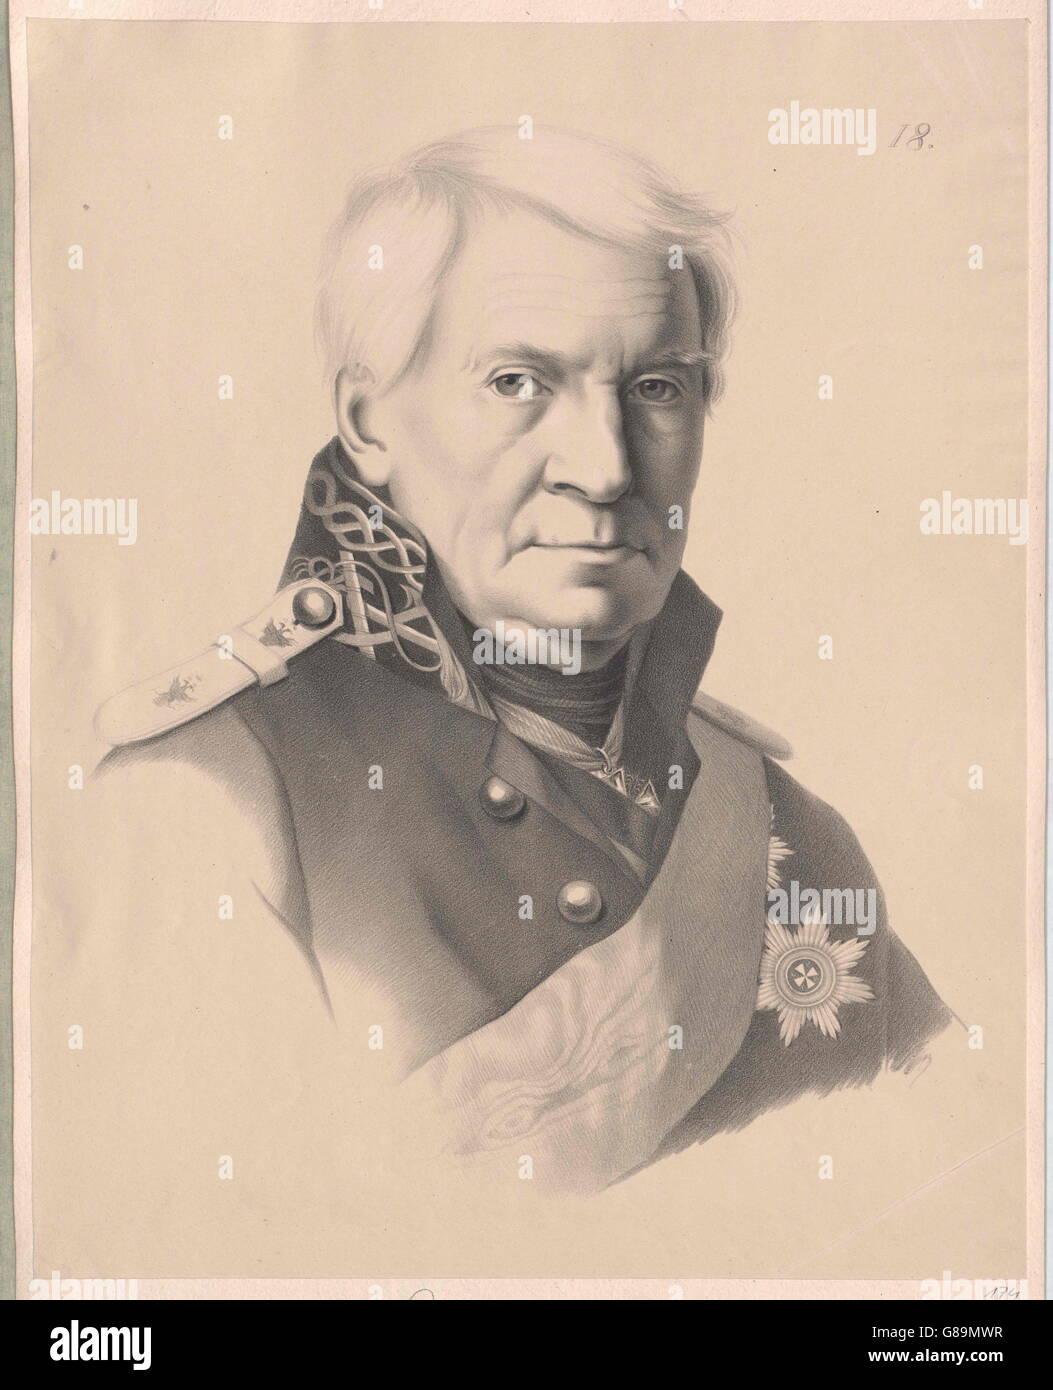 Schischkow, Aleksandr Semenovic - Stock Image